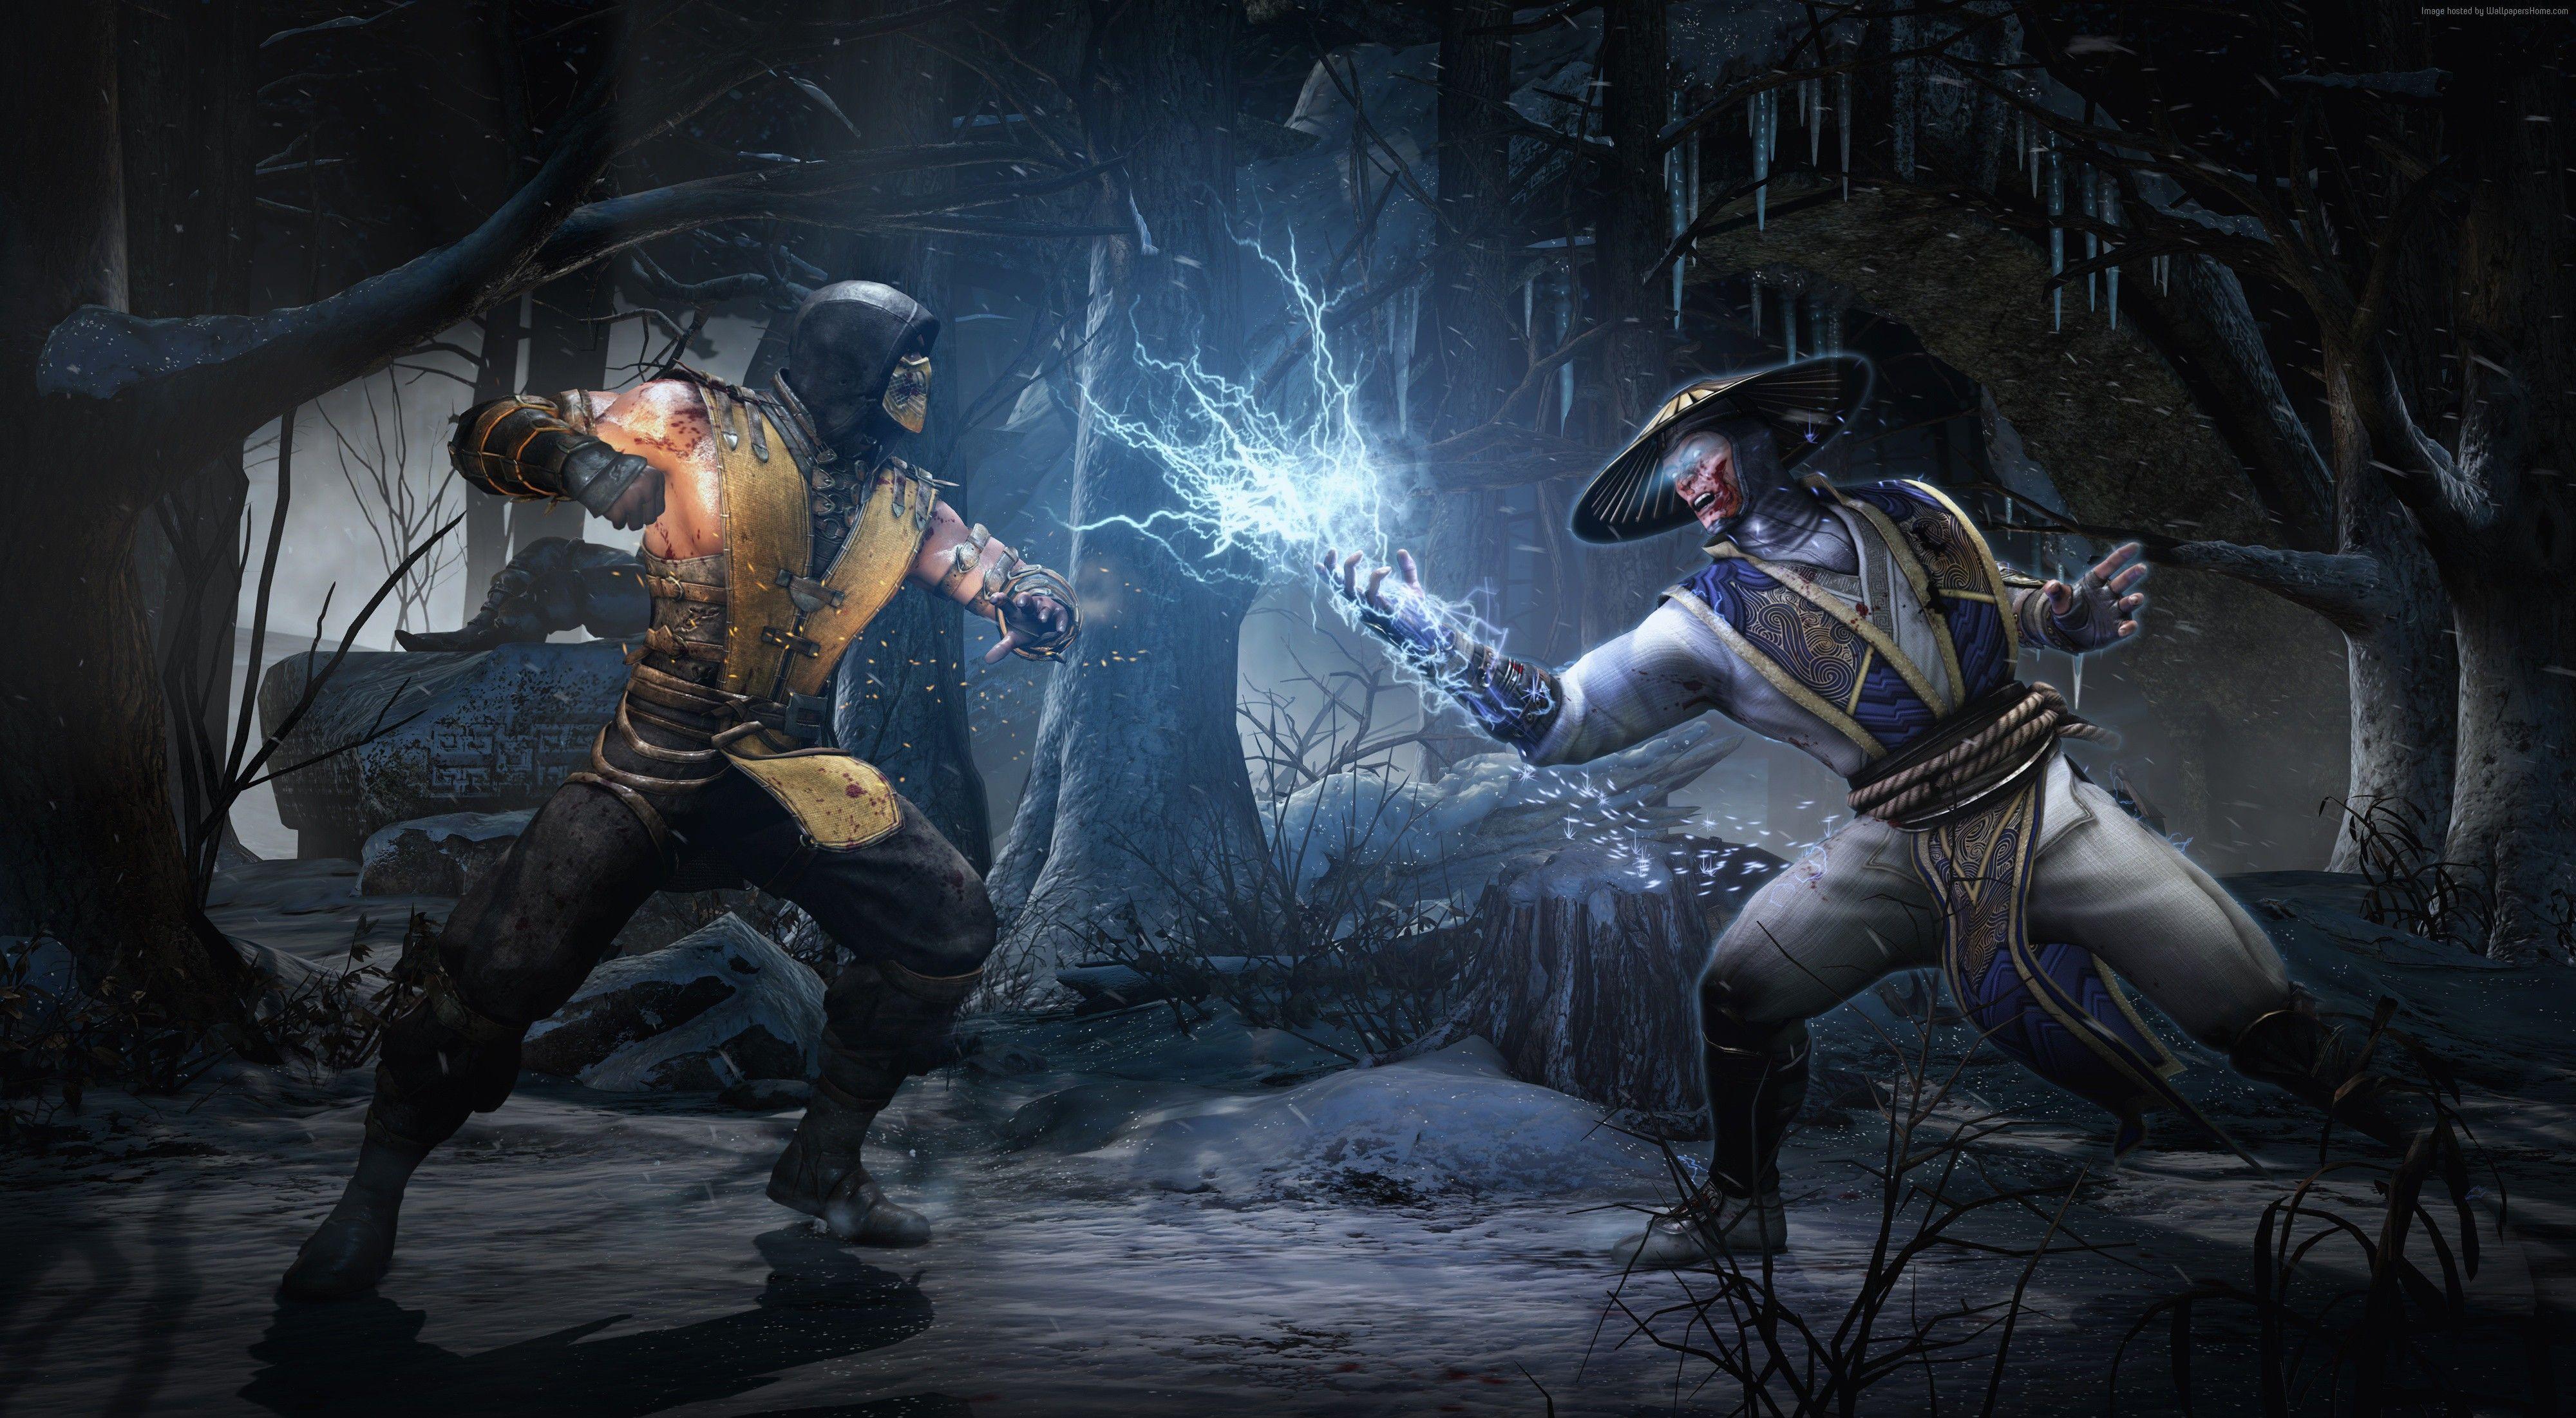 Mortal Kombat X Wallpaper, Games \/ Others: Mortal Kombat X